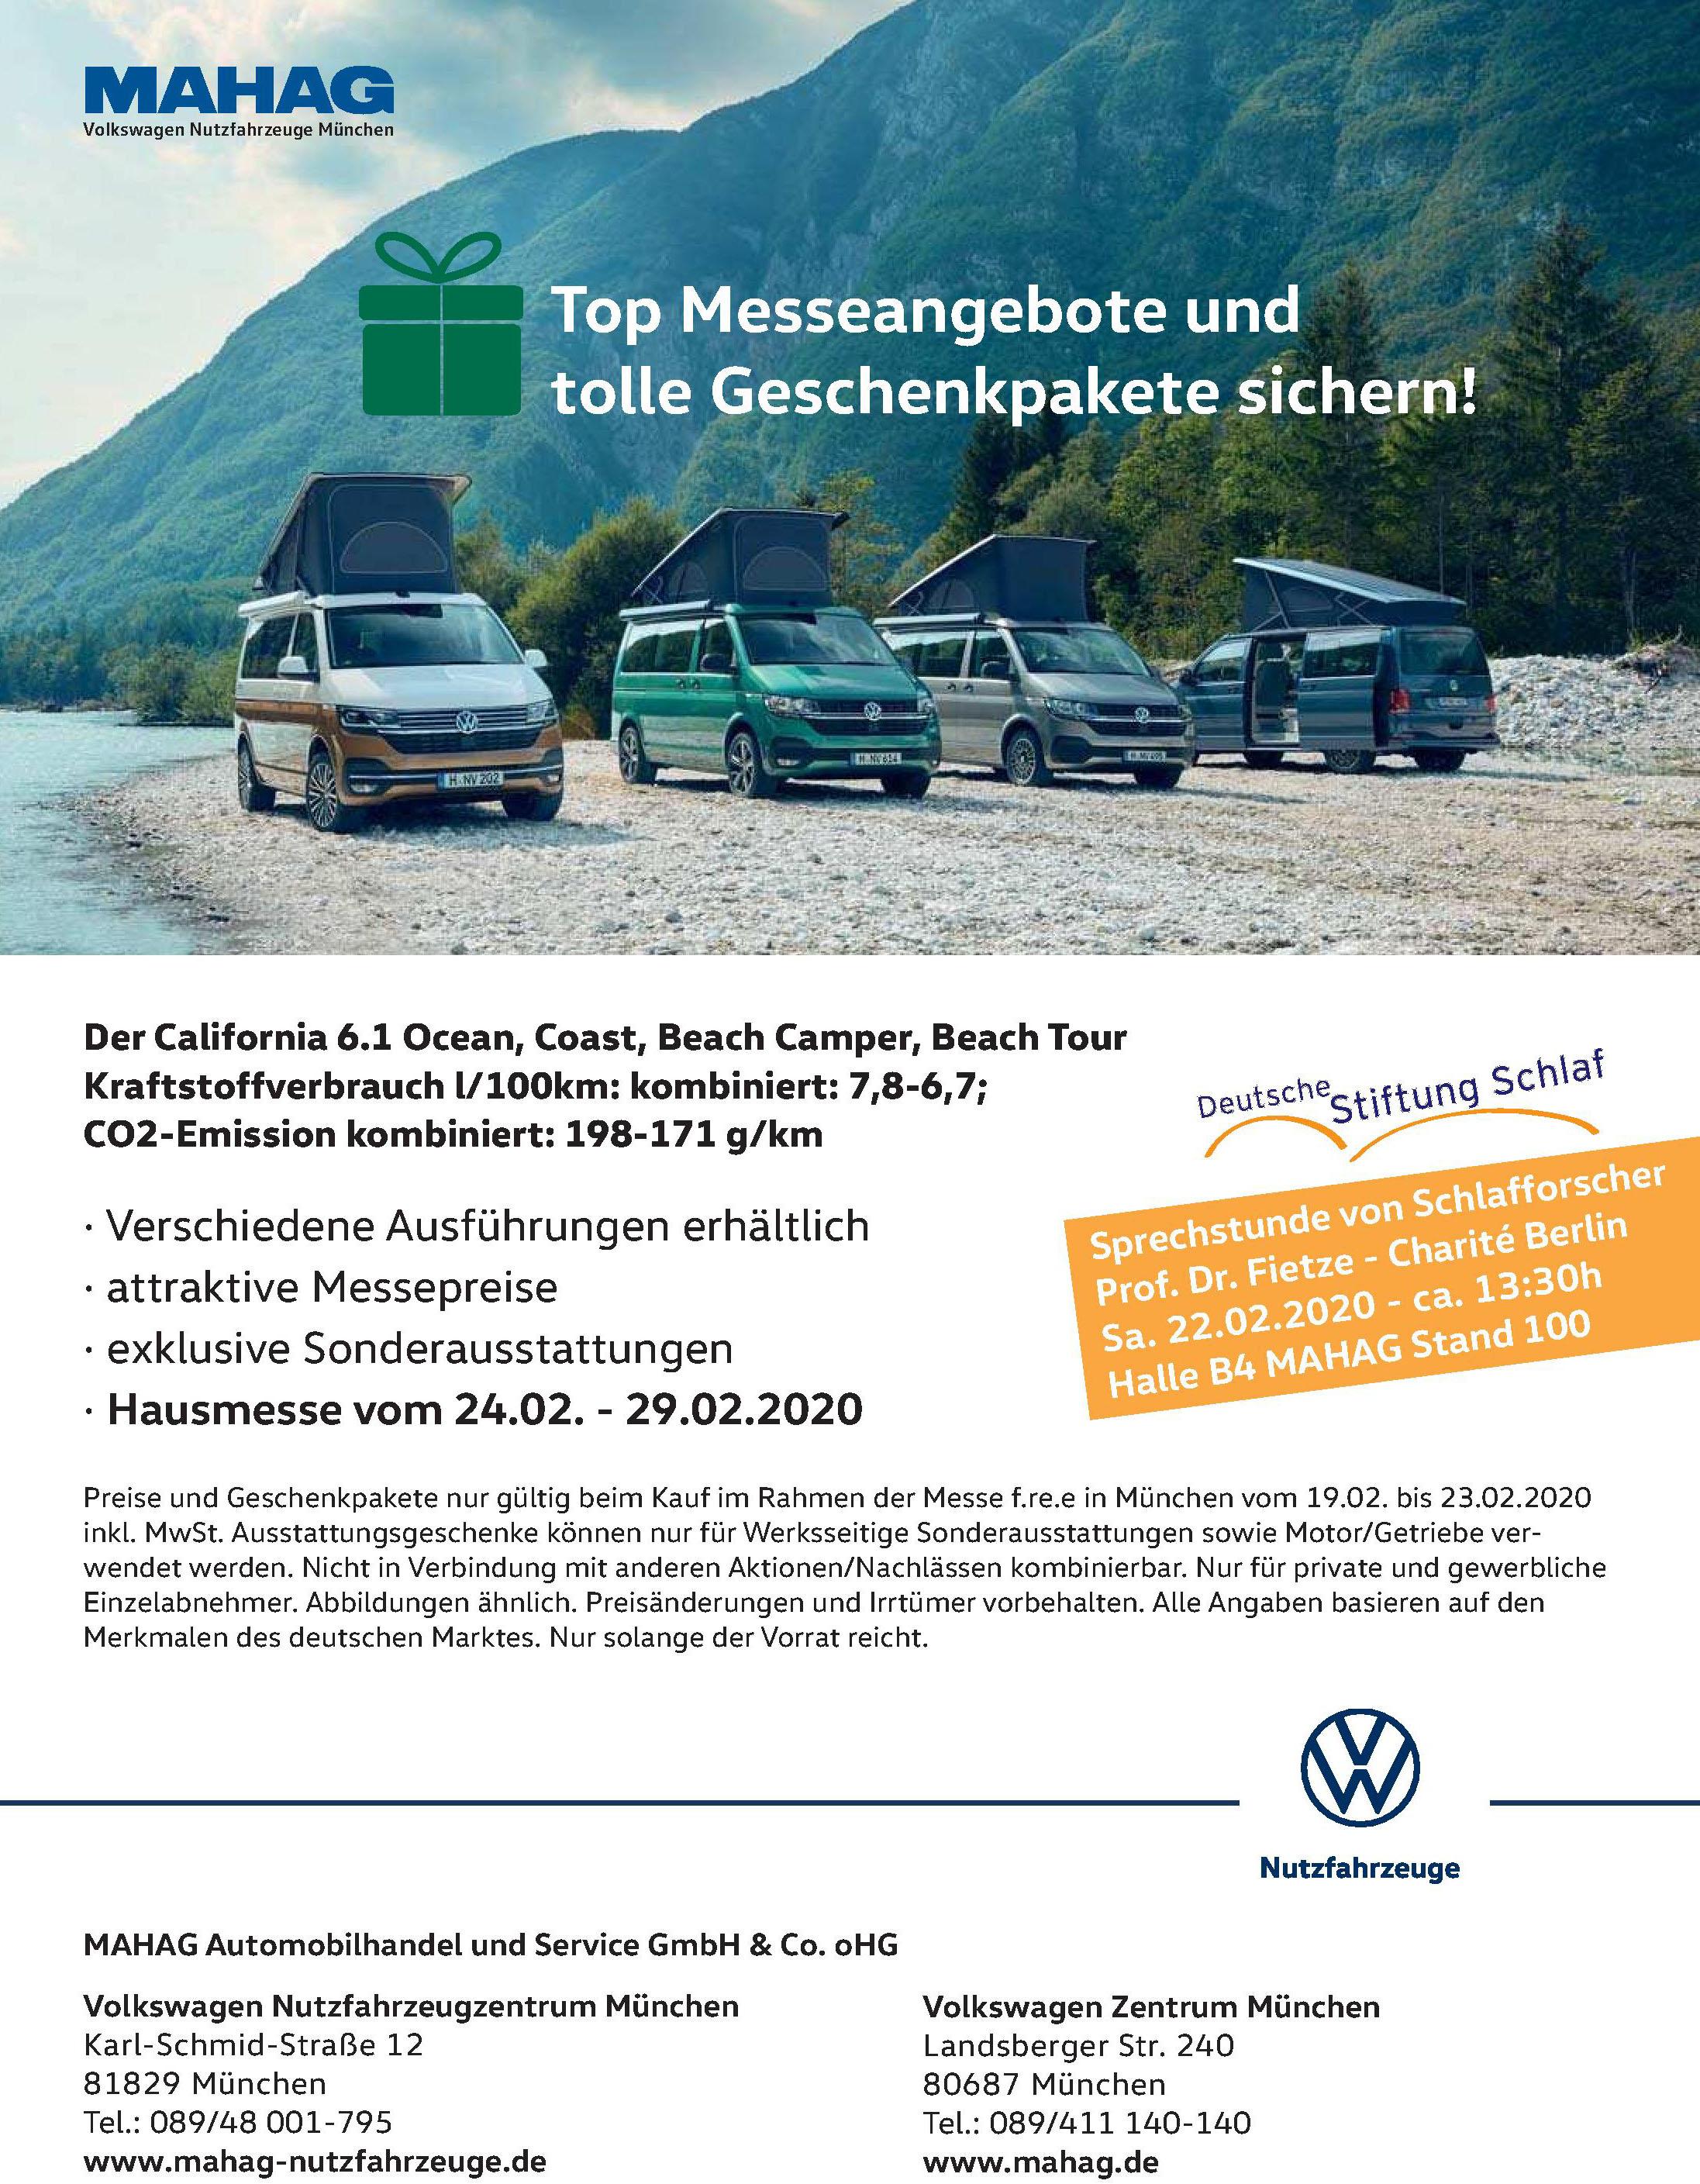 <br><b> MAHAG Automobilhandel und Service GmbH & Co. oHG </b> </p> <br><b> Volkswagen Nutzfahrzeugzentrum München </b> <p></p> Karl-Schmid-Straße 12 <p></p> 81829 München <p></p> Tel.: 089/48 001-795 <p></p><a href='https://mahag-nutzfahrzeuge.de'>mahag-nutzfahrzeuge.de</a> </p> <hr> <br><b> Volkswagen Zentrum München </b> <p></p> Landsberger Str. 240 <p></p> 80687 München <p></p> Tel.: 089/411 140-140 <p></p><a href='https://mahag.de'>mahag.de</a> </p>